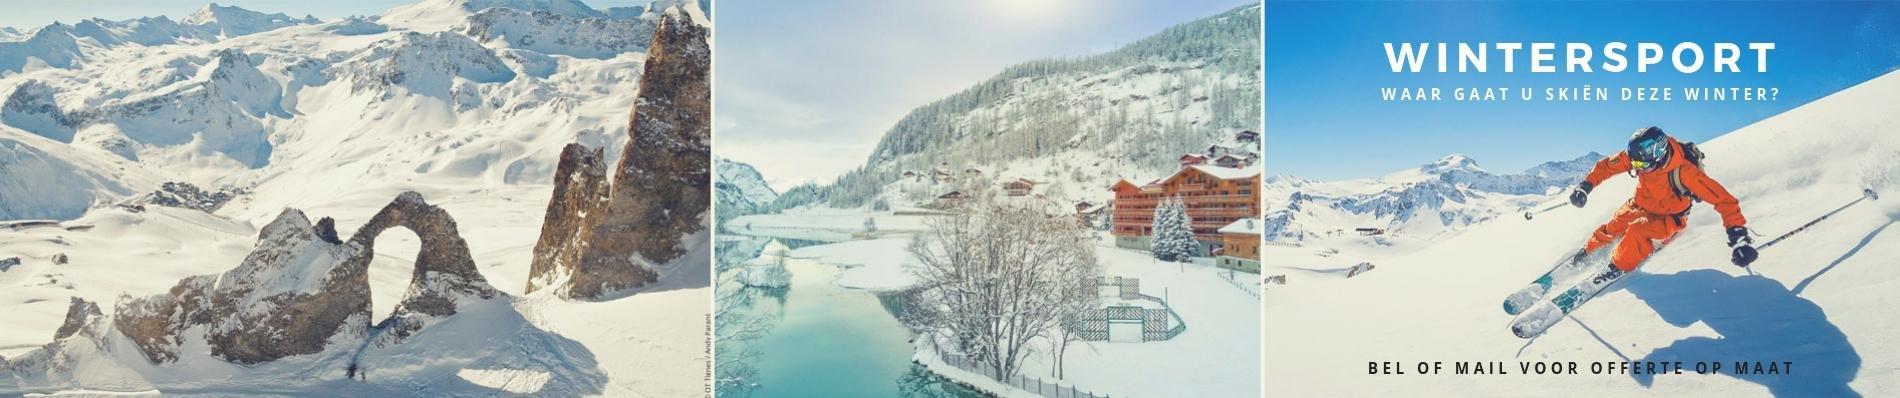 Frankrijk wintersport 2020